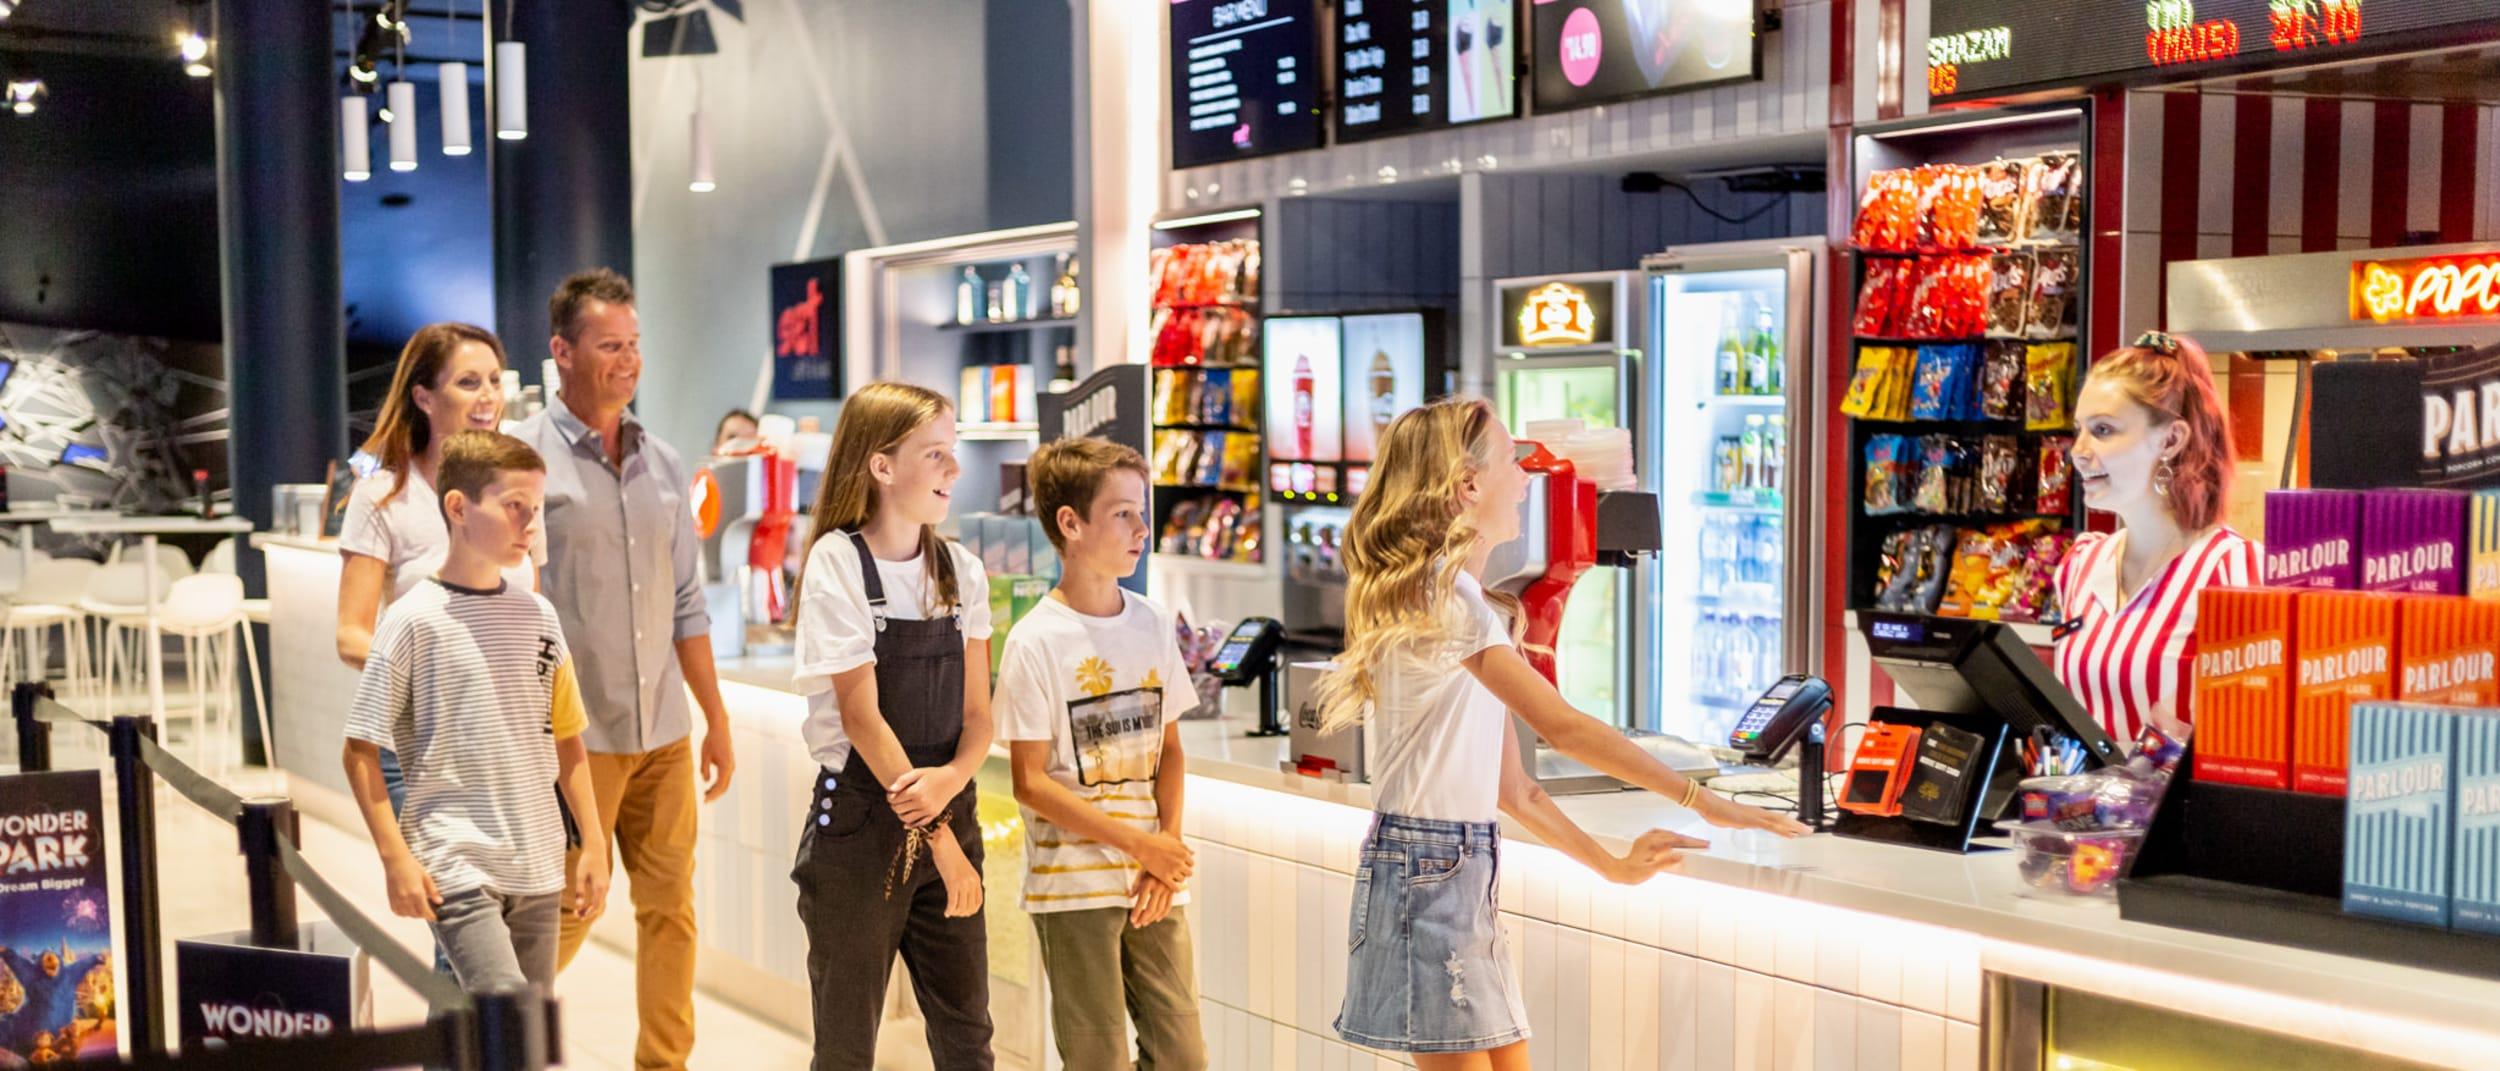 School holiday activities at Event Cinemas